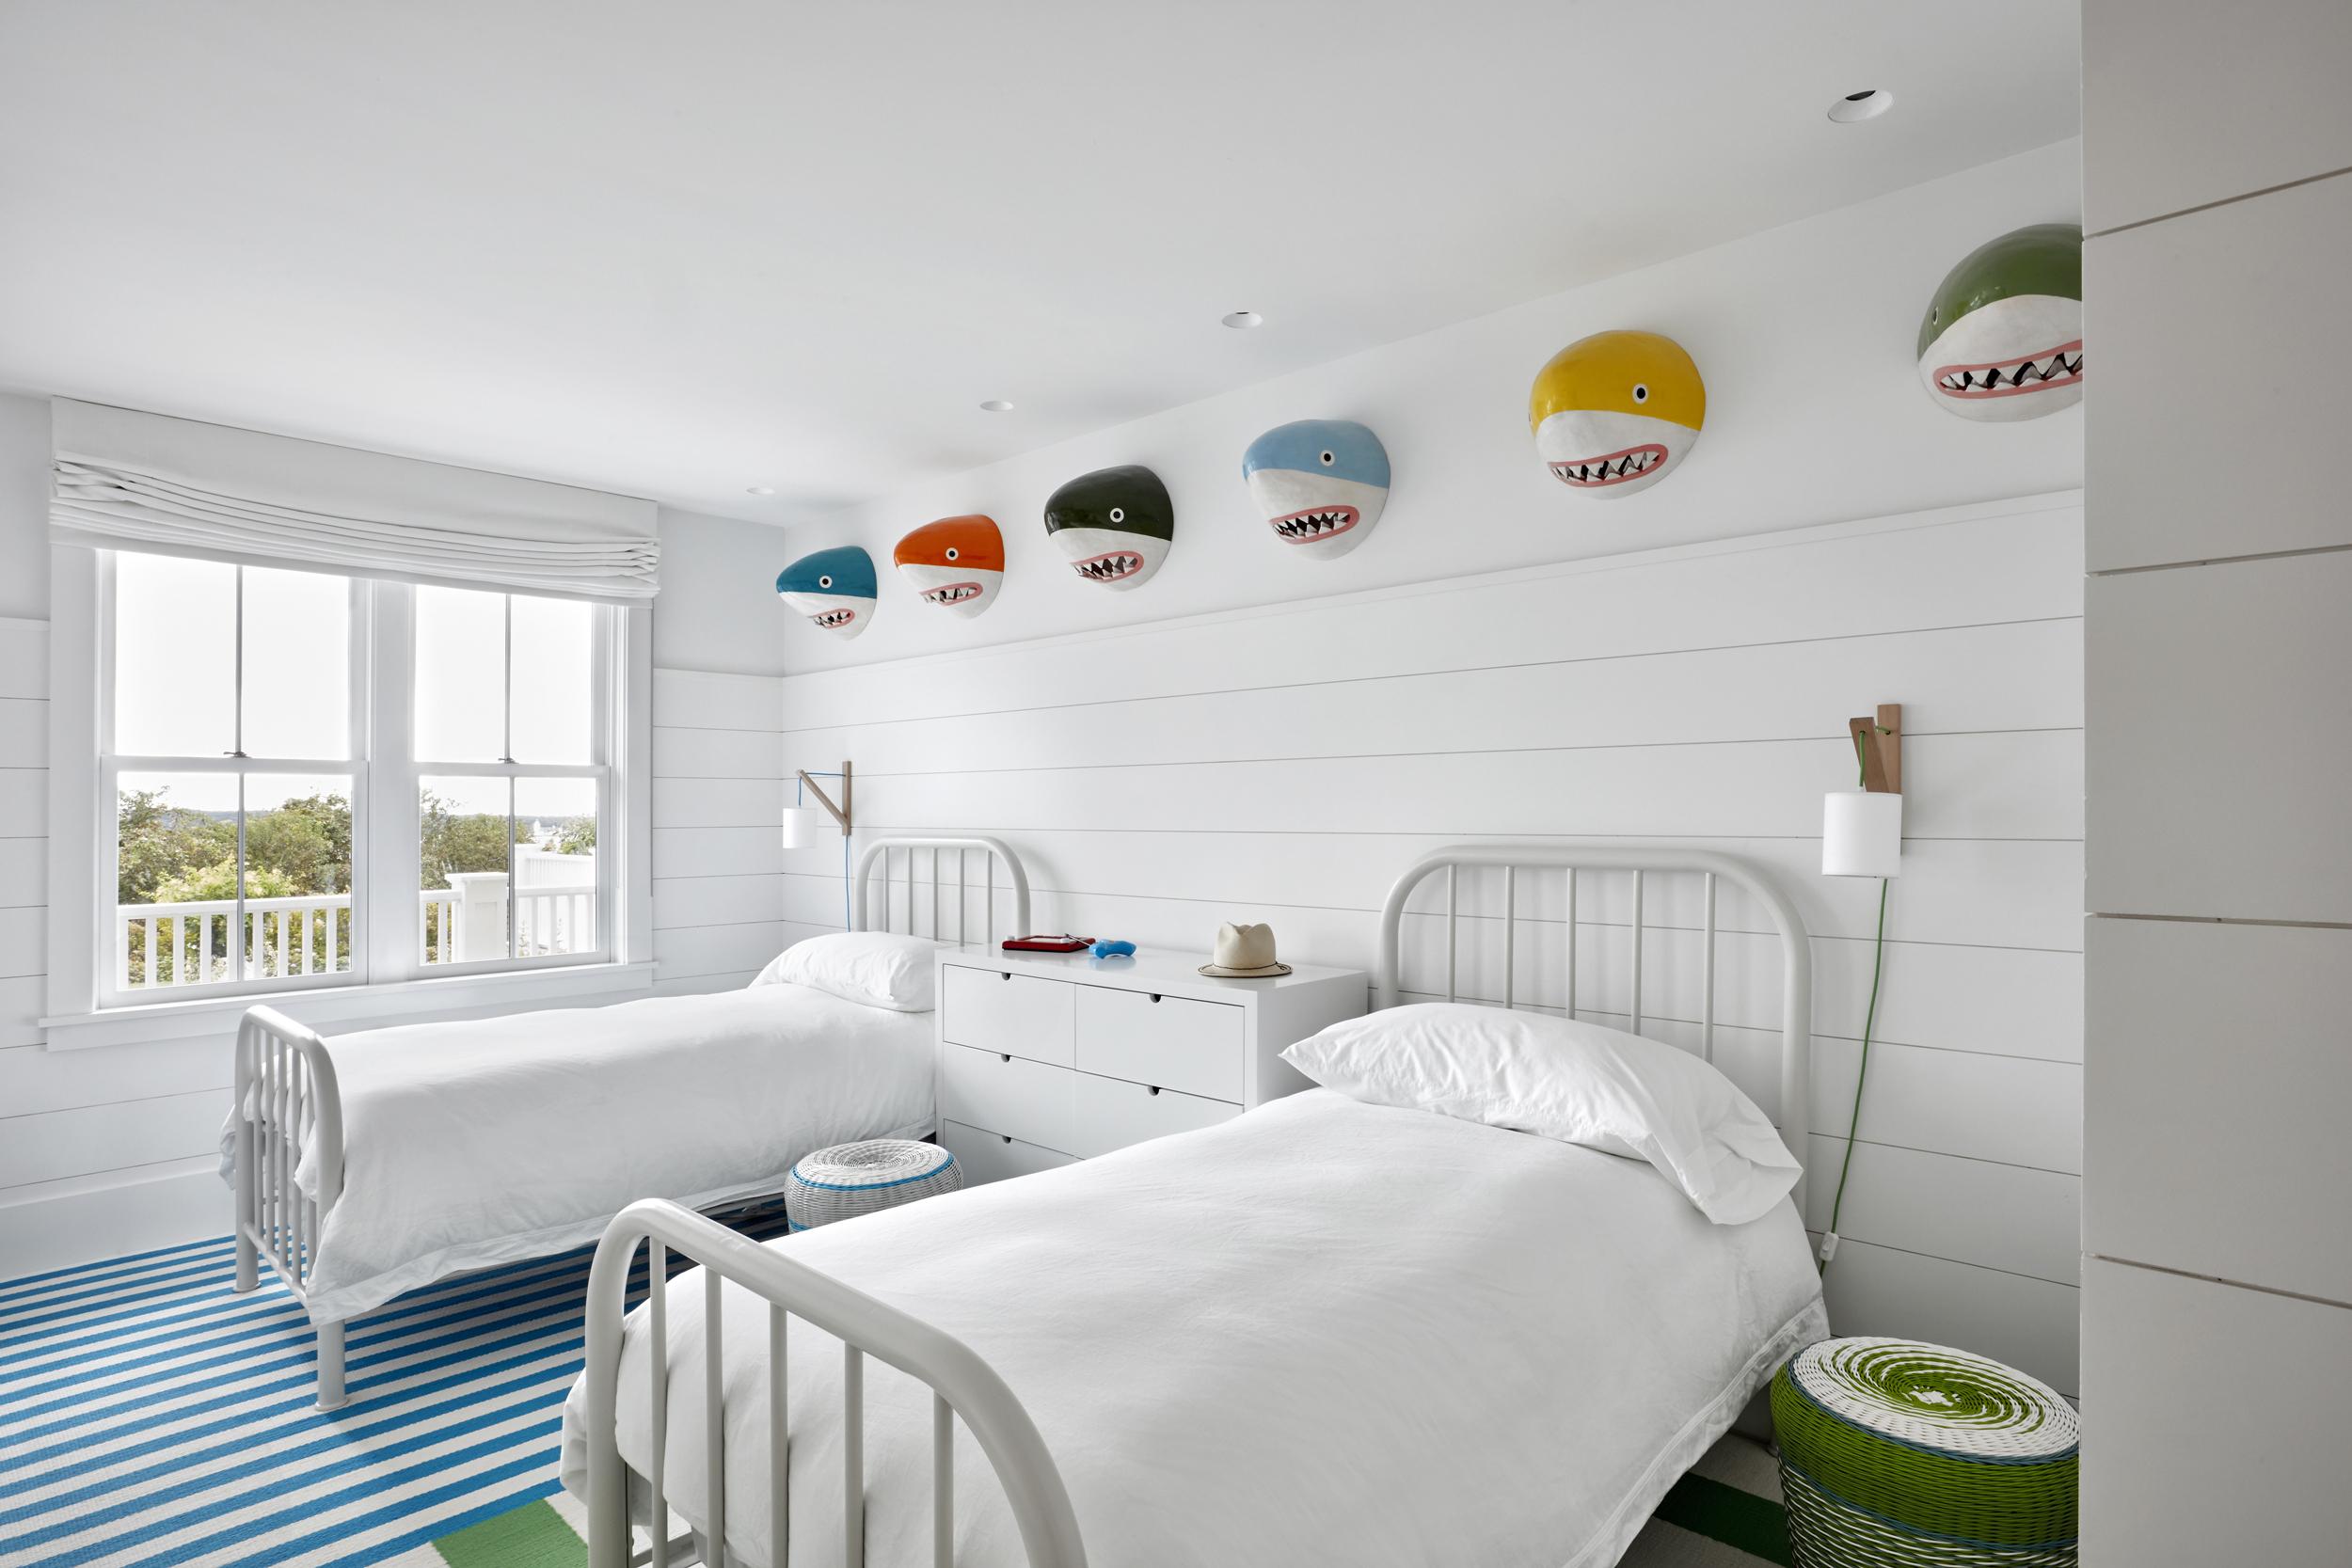 © ghislaine vinas interior design_montauk_twins1.jpg